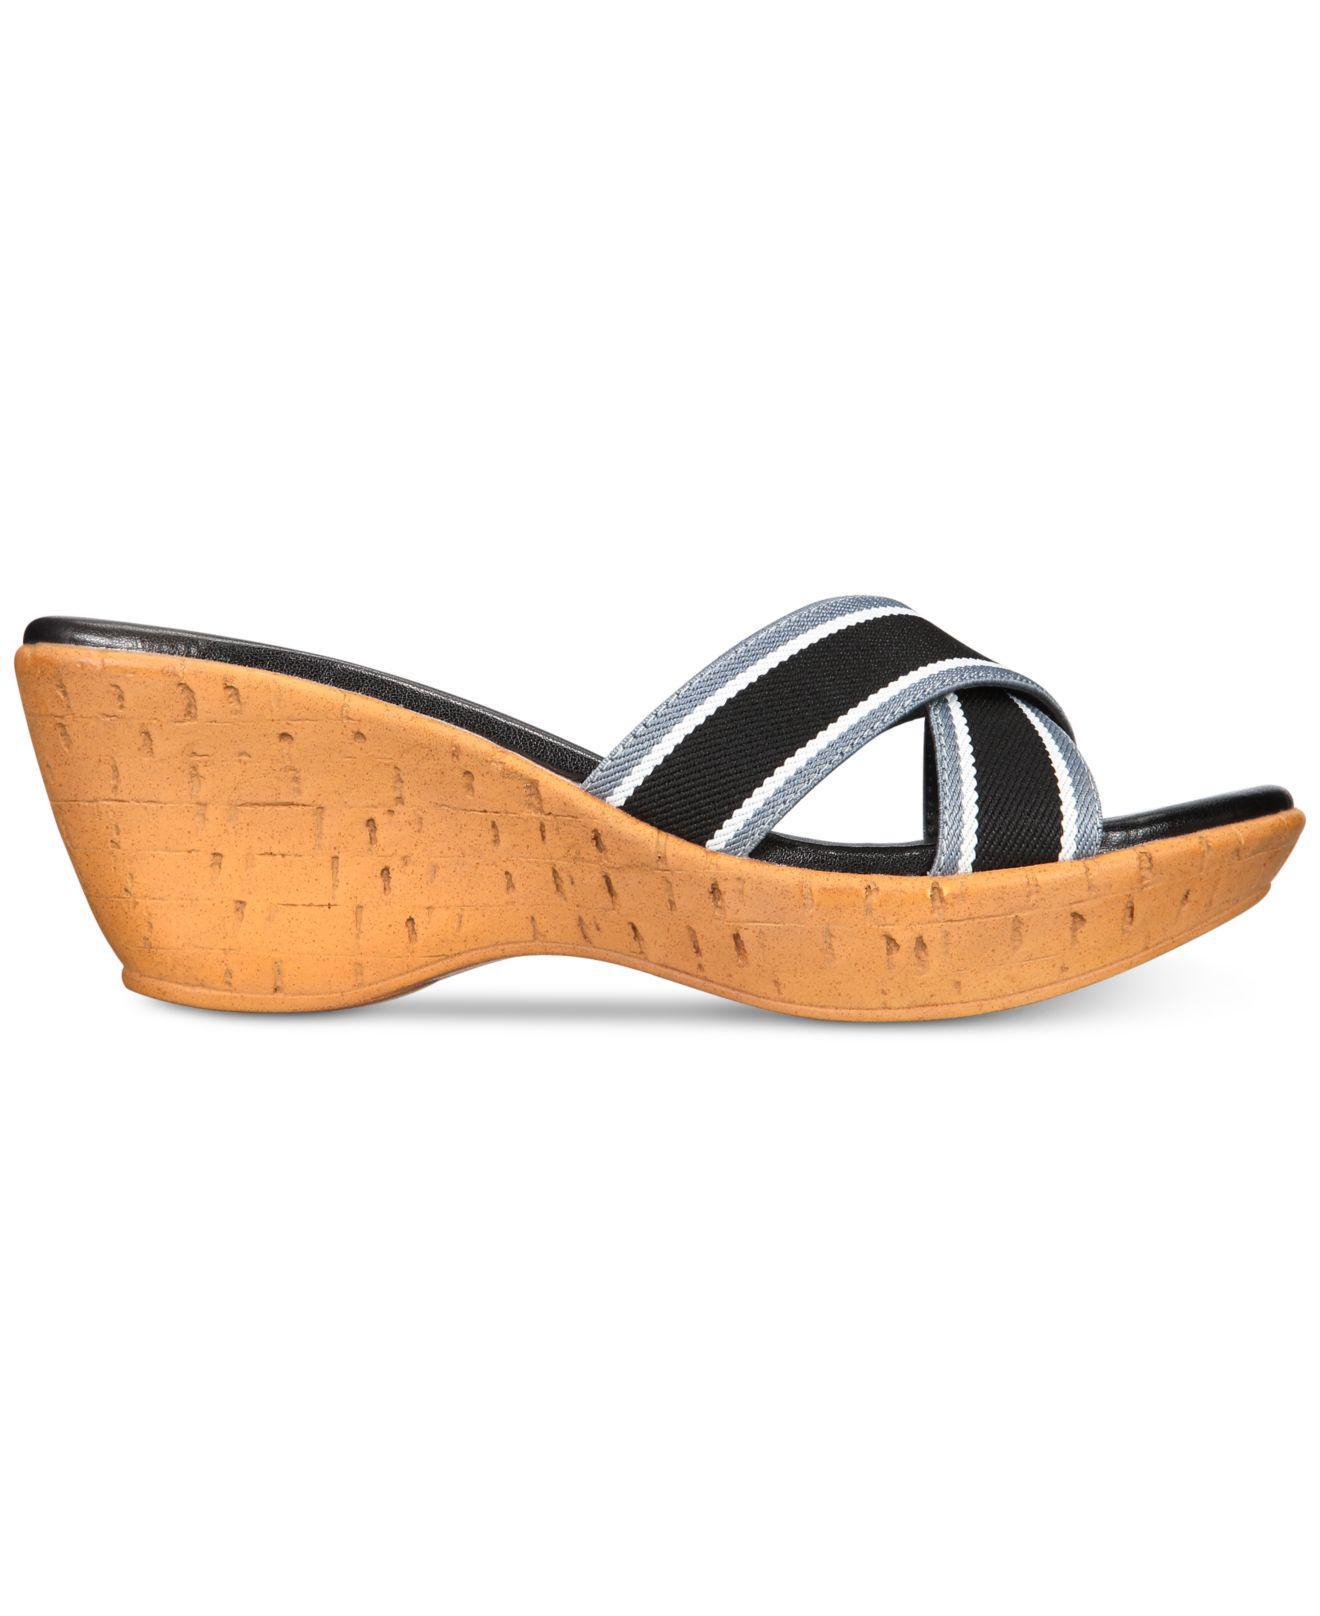 3e3ff6fd7fcd Lyst - Callisto Segway Slide Platform Wedge Sandals